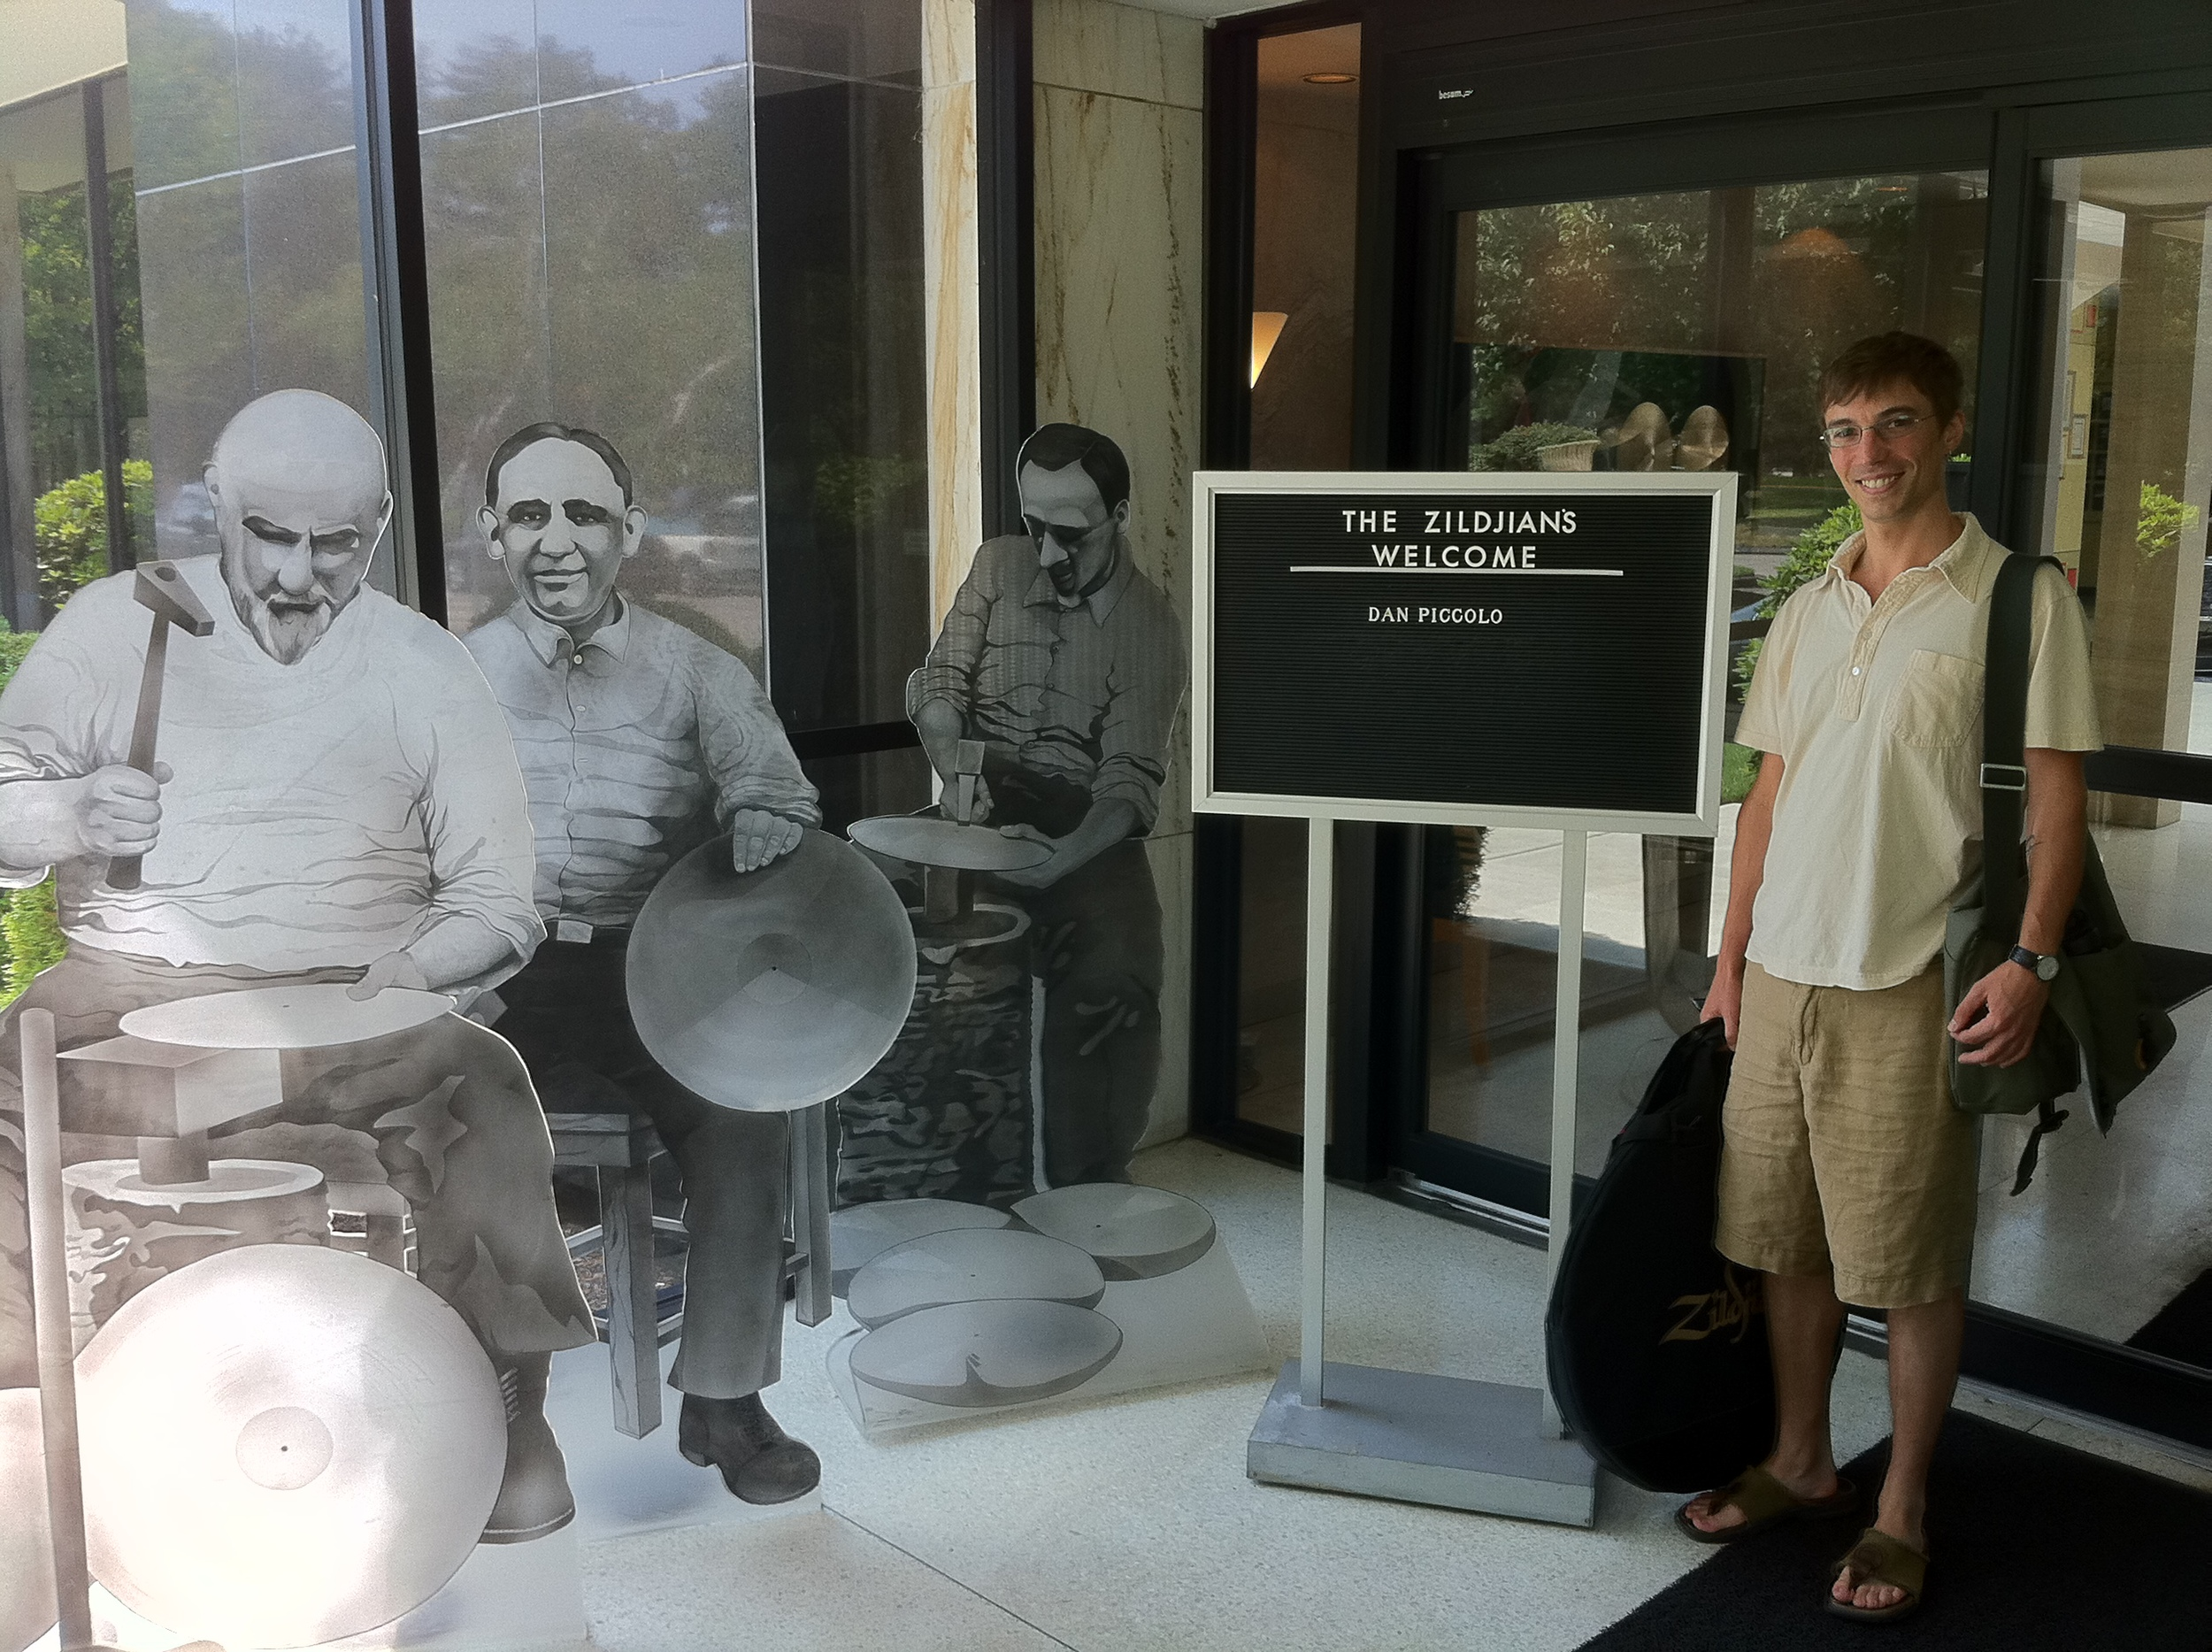 Visiting the Zildjian cymbal factory in Lowell, MA, 2011